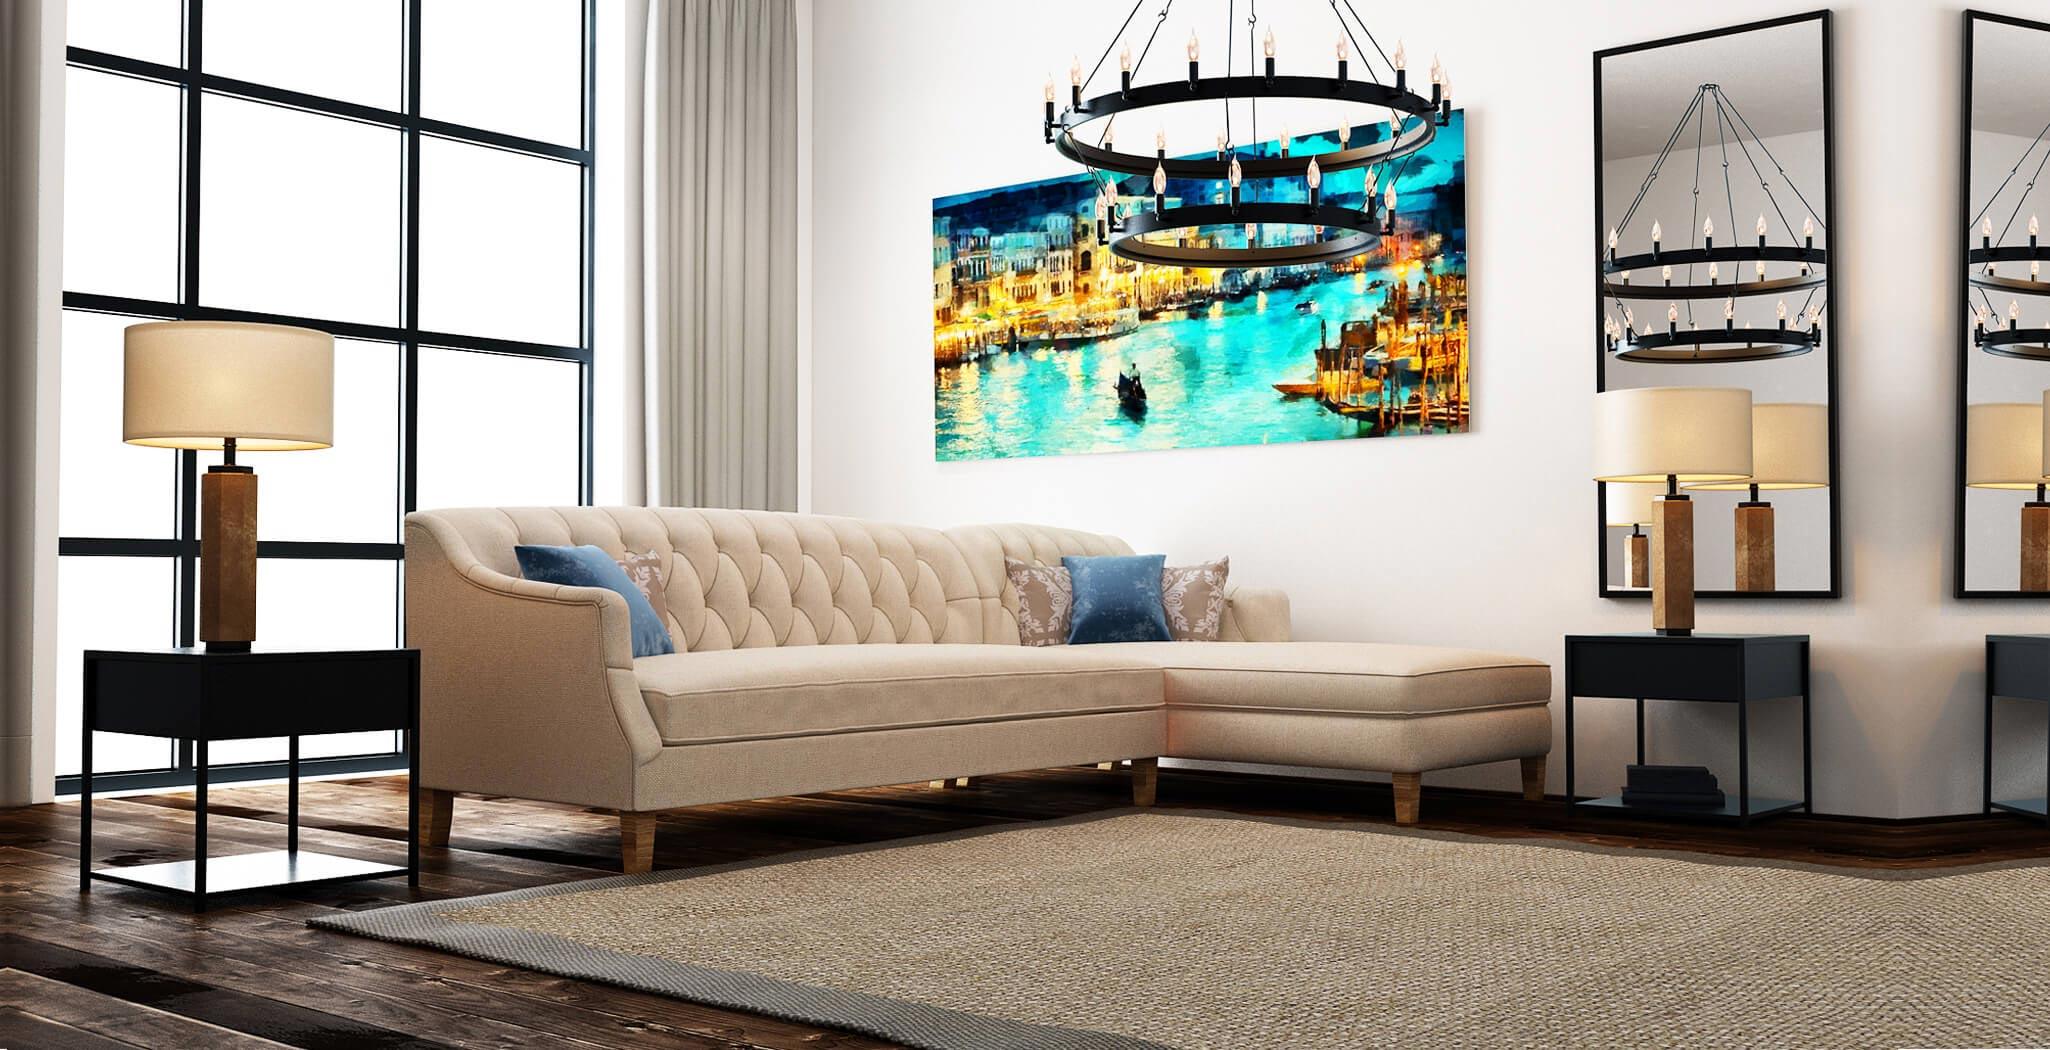 shiraz panel furniture gallery 1